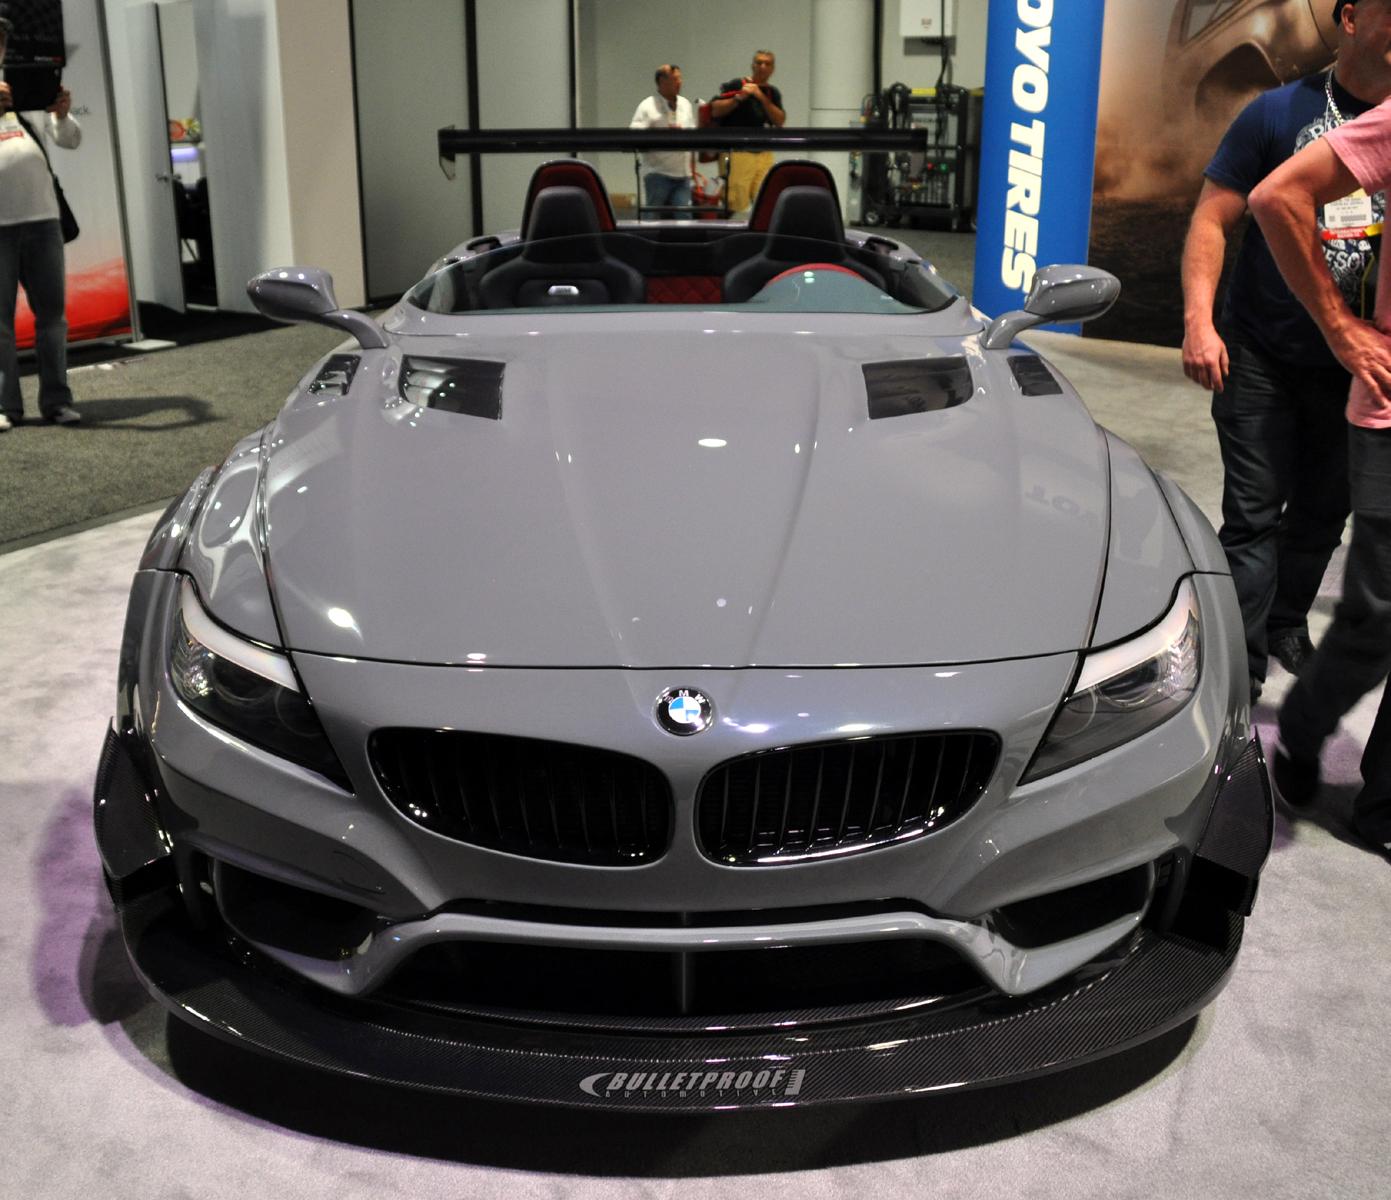 Bmw Z4 I: Just A Car Guy: BMW Z4 GT Roadster From Bulletproof